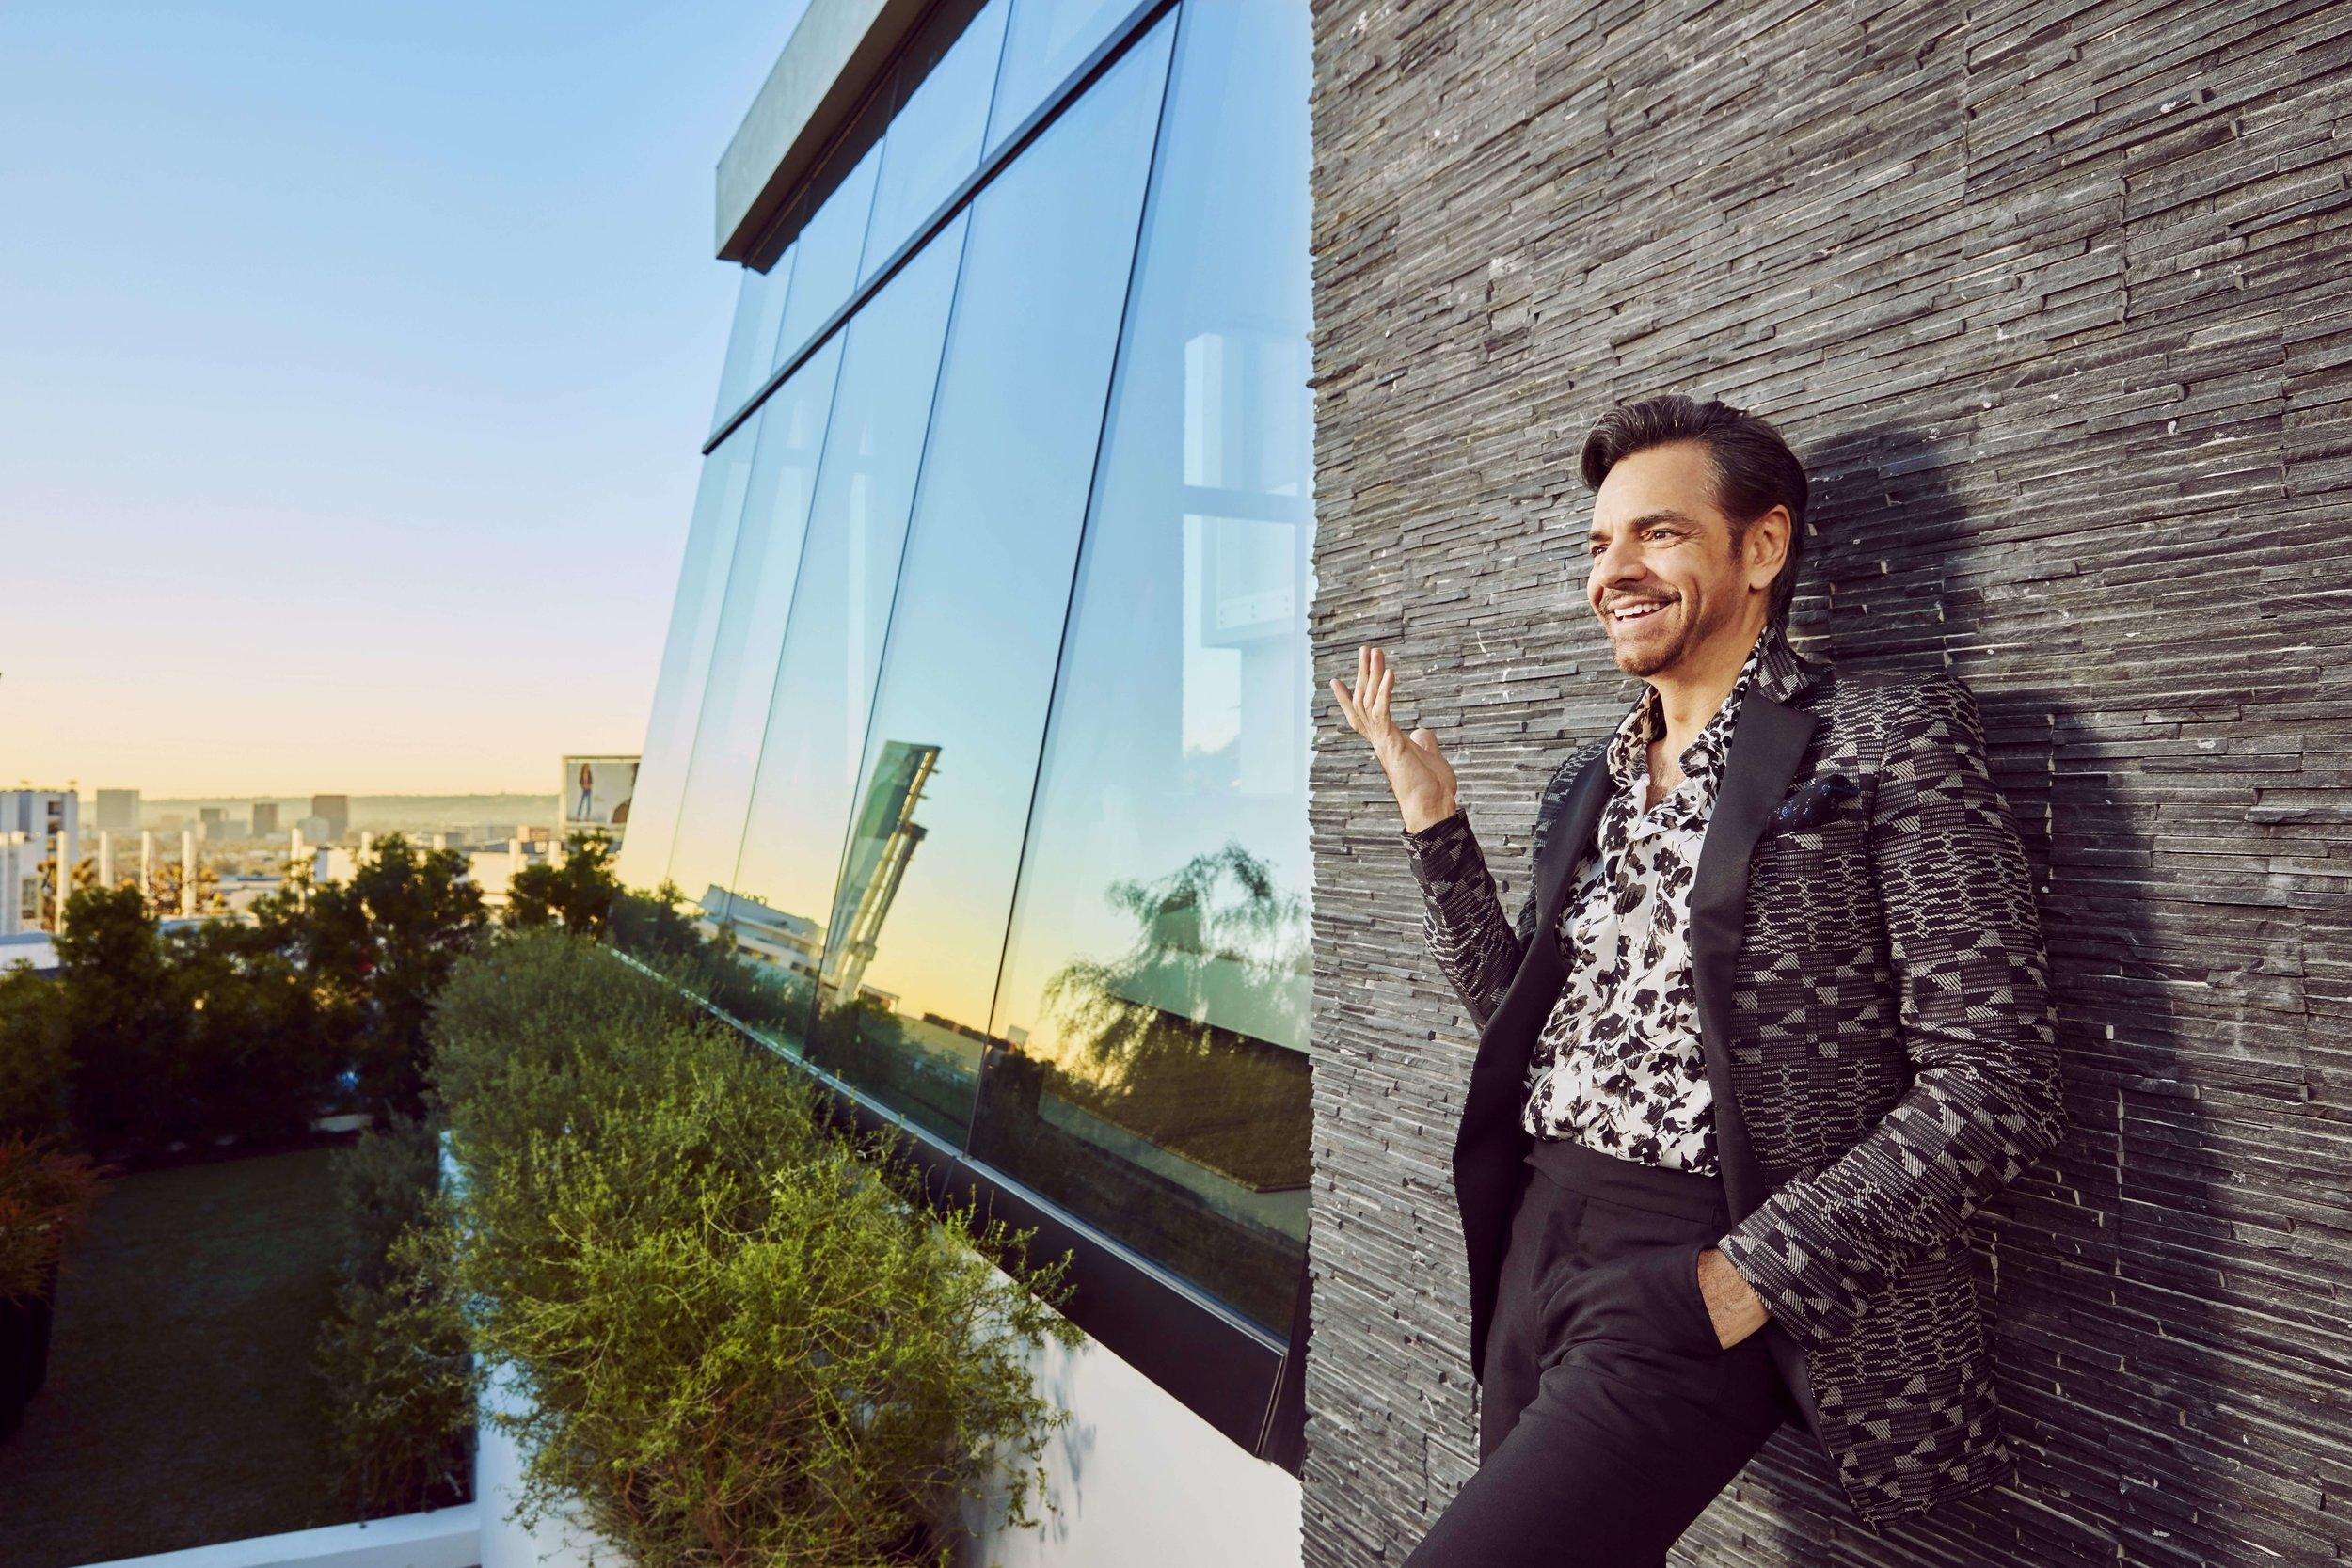 Mark DeLong - Celebrity Photographer - Actor outside leaning against modern building.